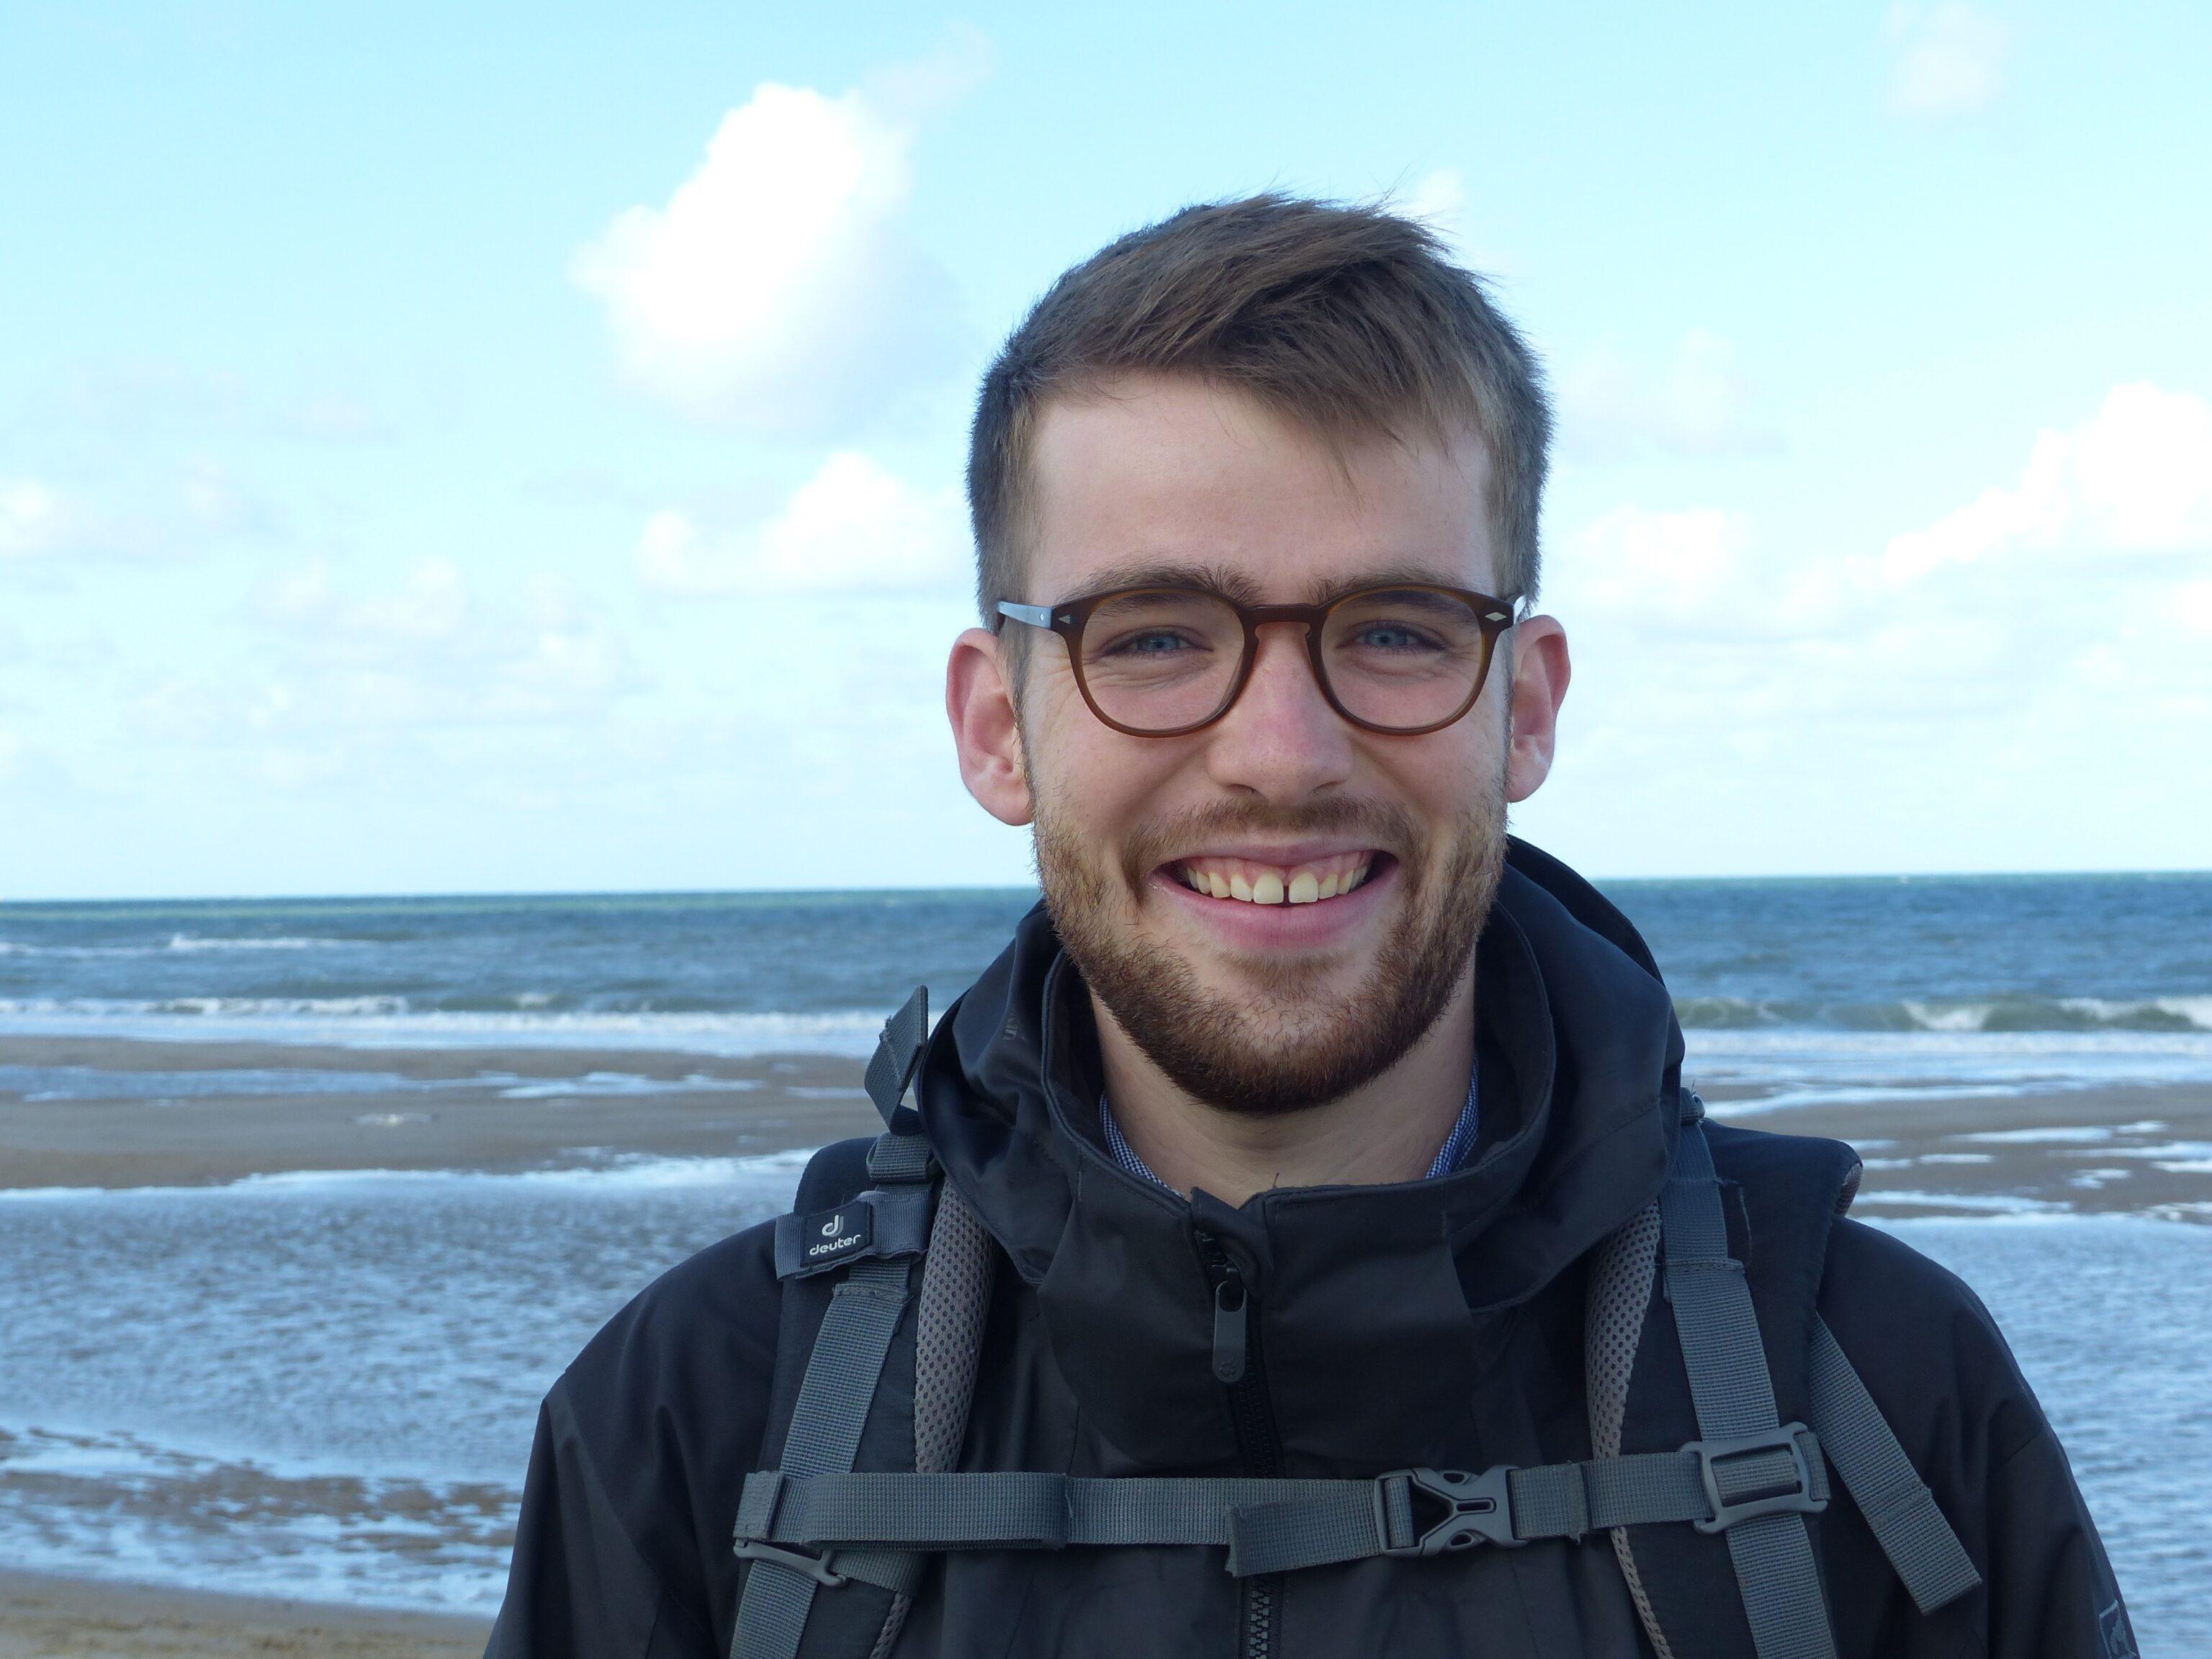 Jens Terhaar vom Oeschger-Zentrum für Klimaforschung